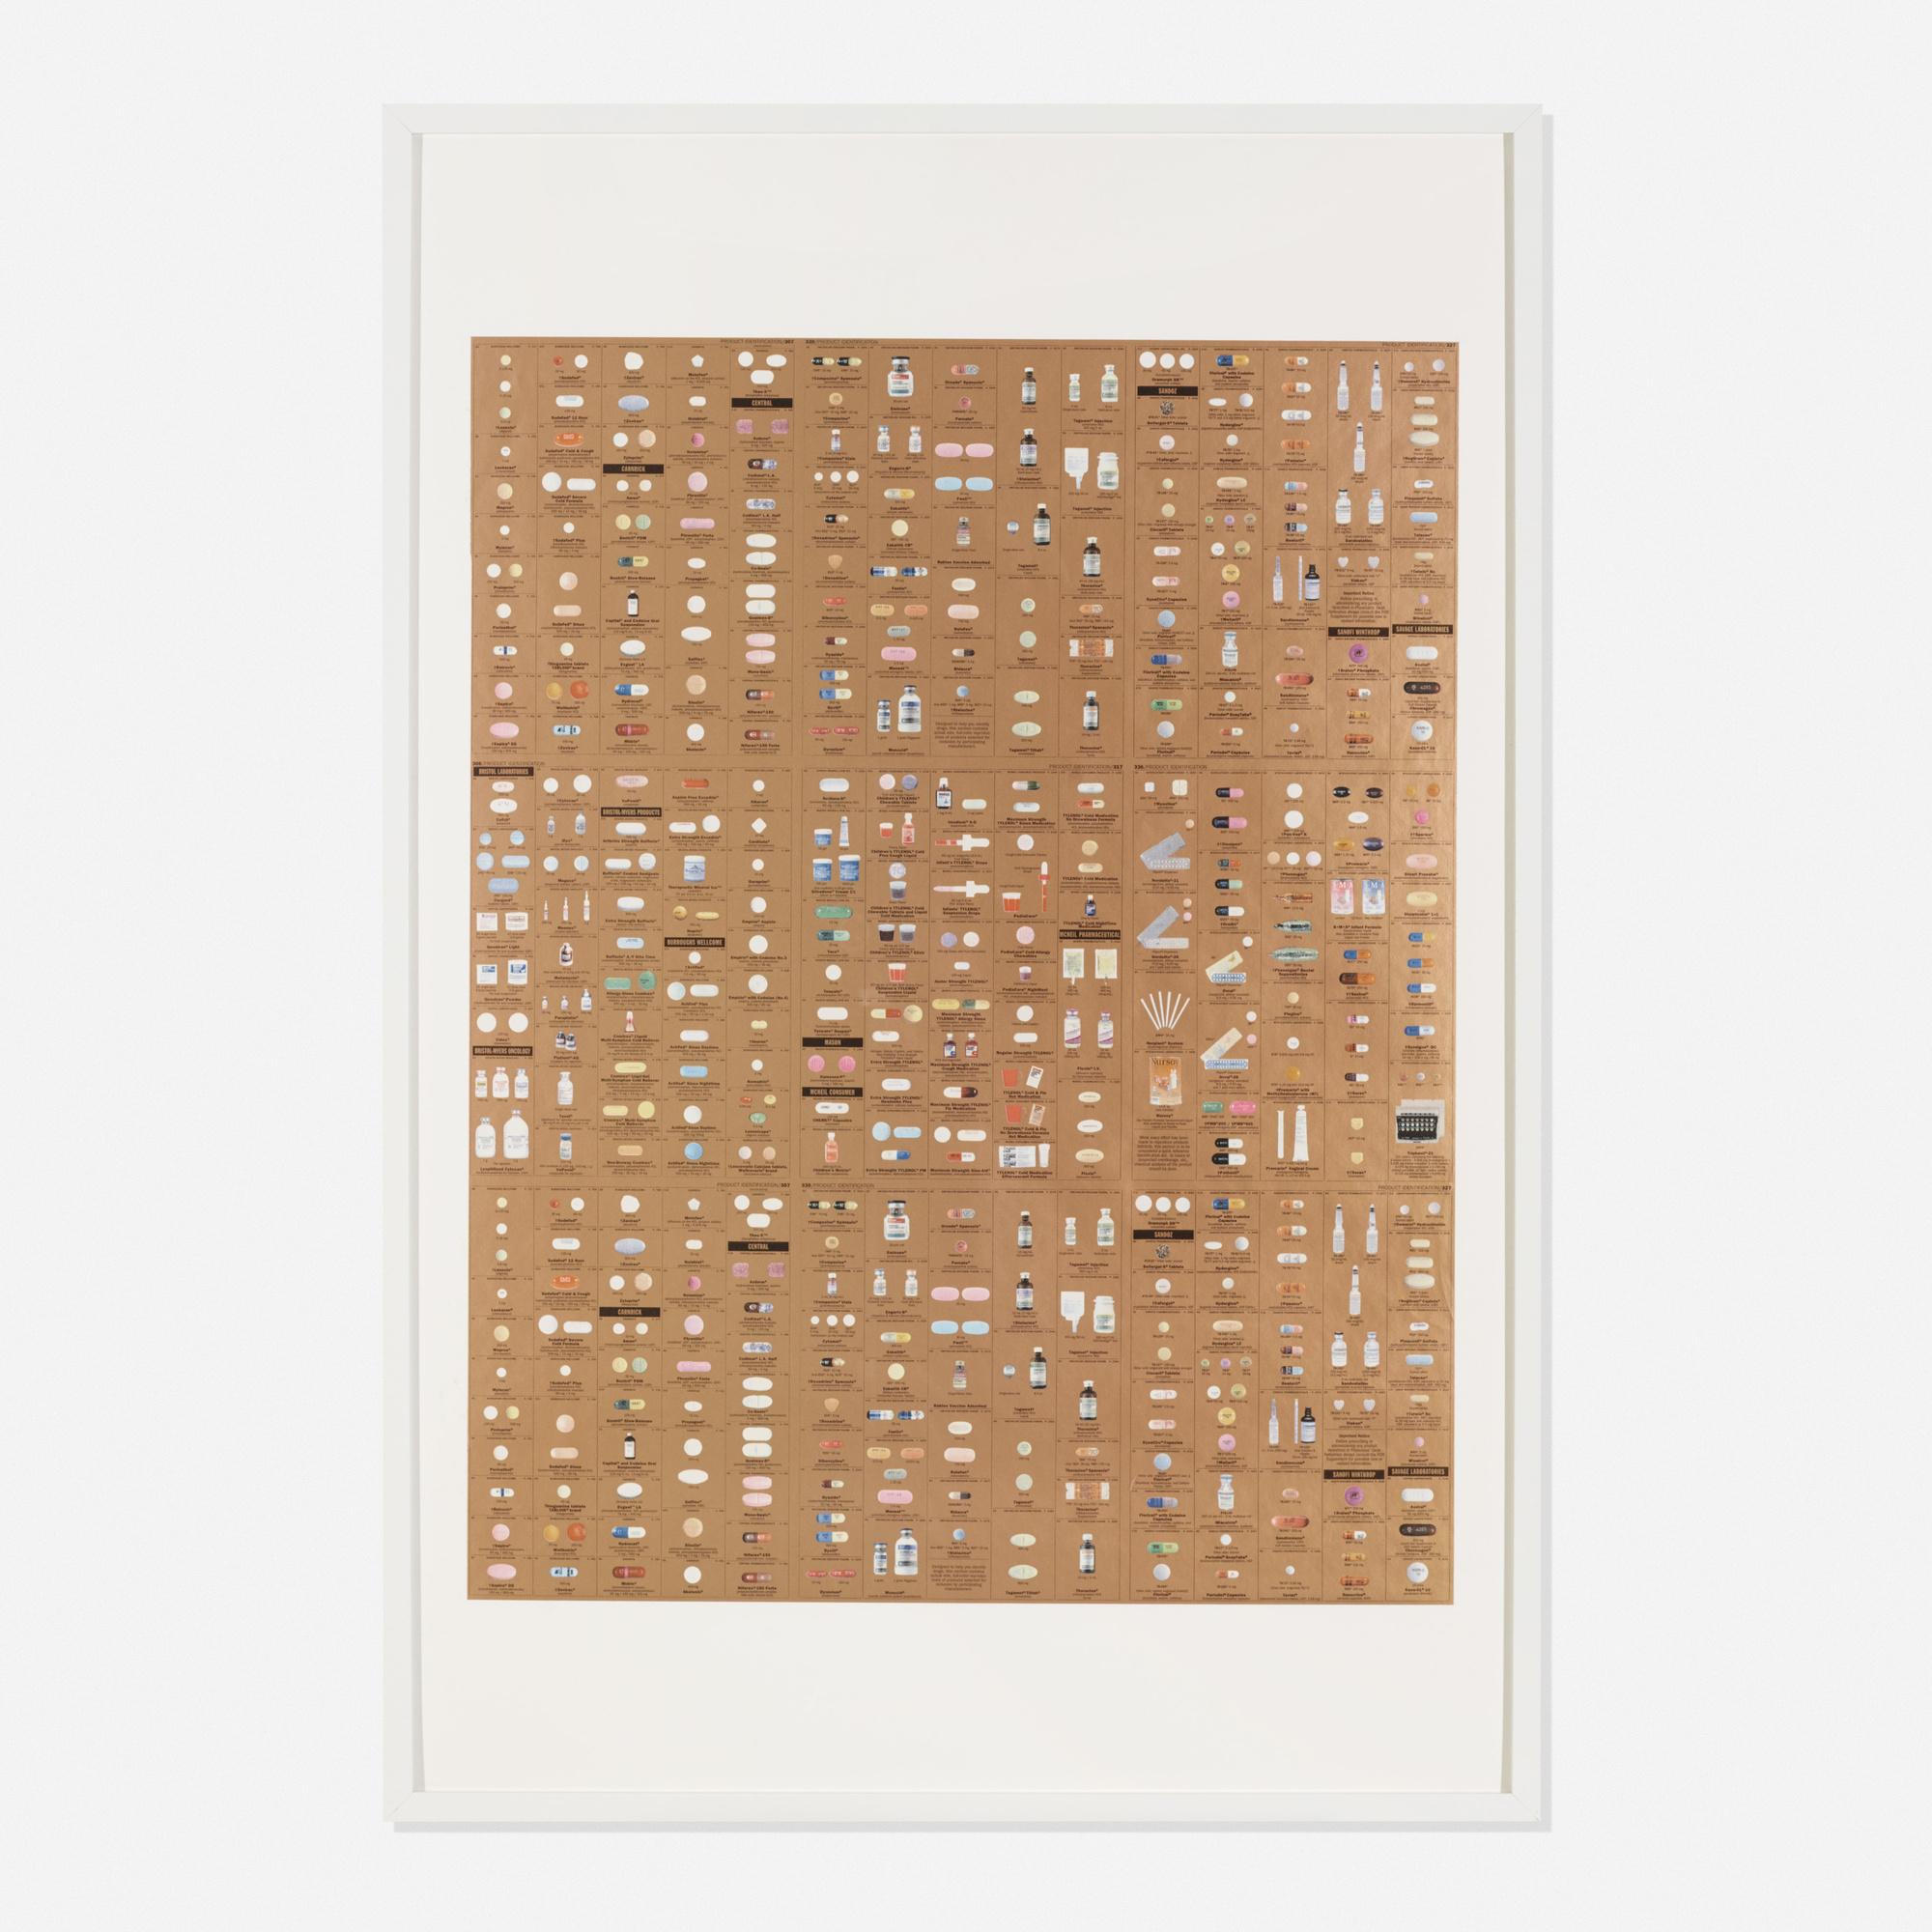 354: Damien Hirst / Pharmacy wallpaper (1 of 1)